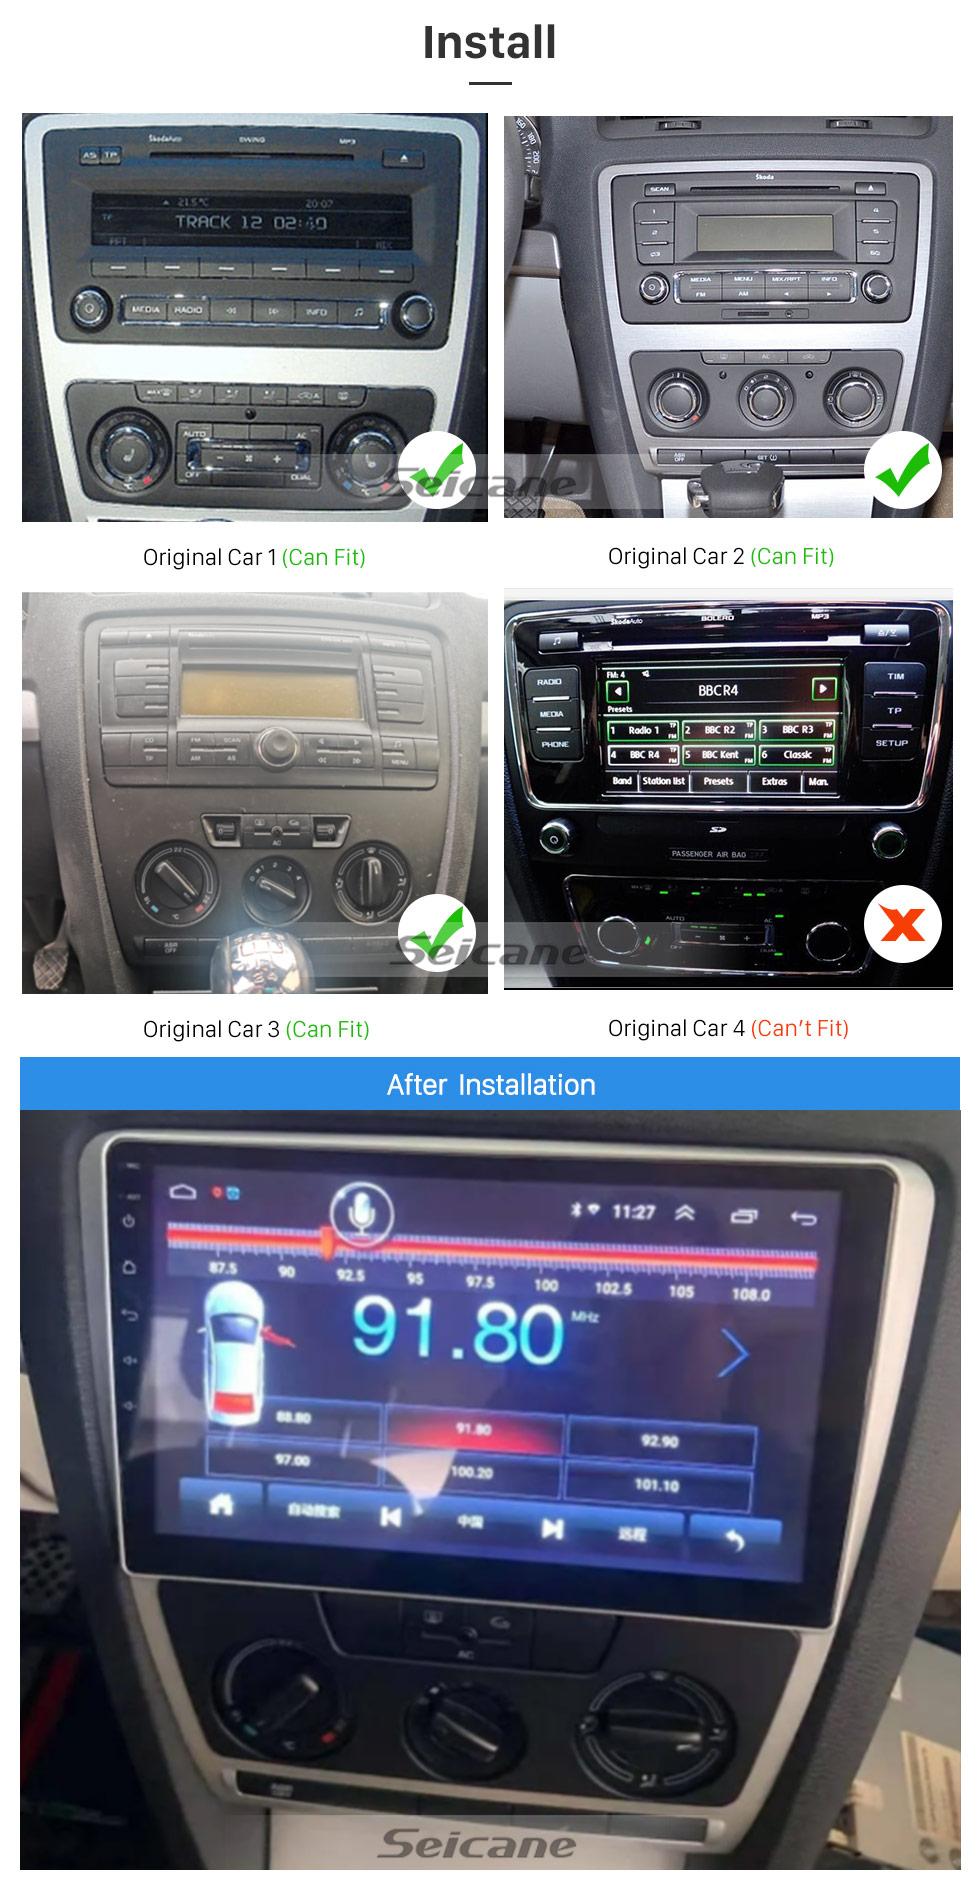 Seicane 10.1 inch Android 10.0 HD Touch Screen 2007-2014 SKODA Octavia Radio GPS Bluetooth Head unit Mirror Link OBD2 TPMS DVR Rearview Camera Digital TV Steering Wheel Control 3G Wifi